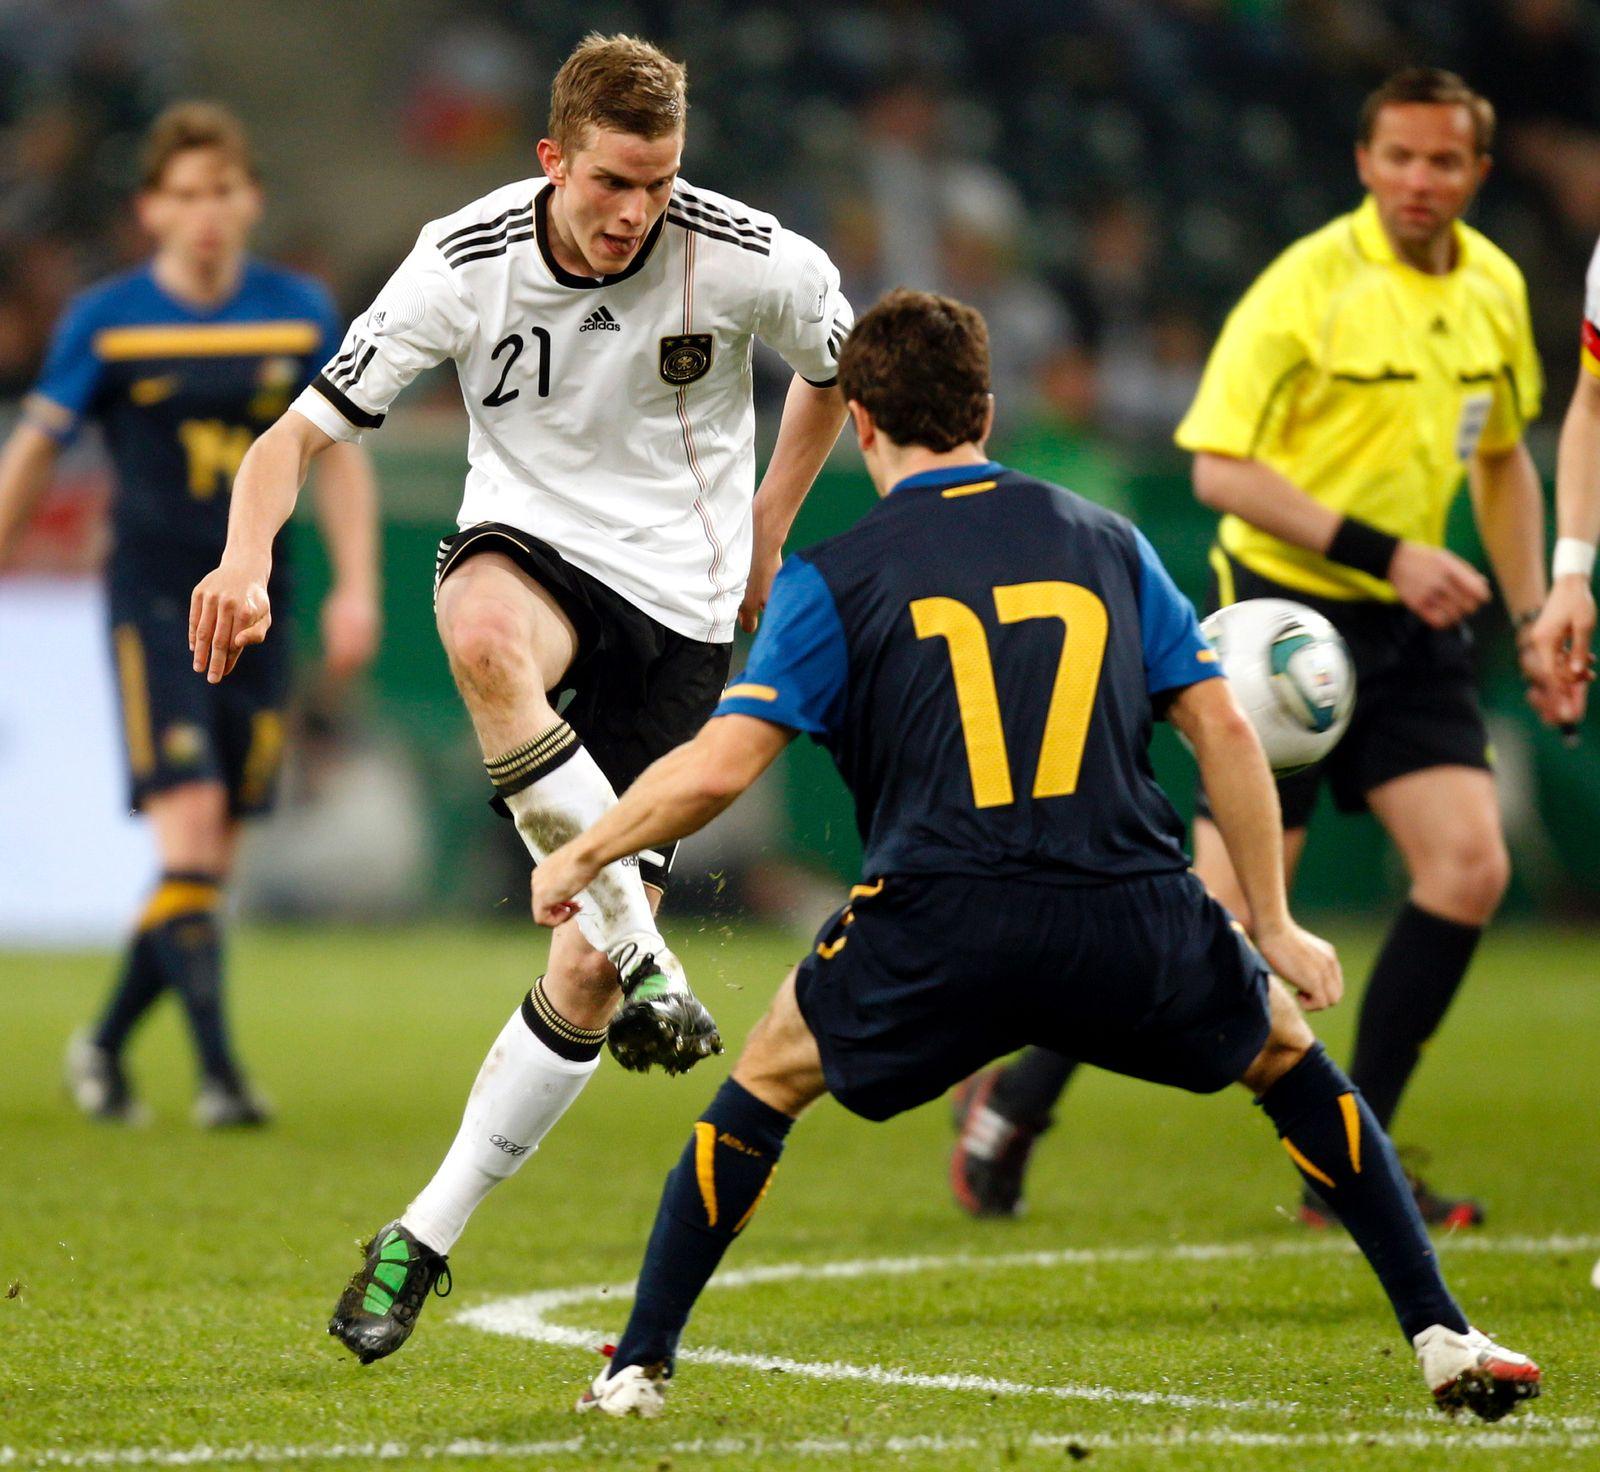 NICHT VERWENDEN Fussball/Nationalmannschaft/Freundschaftsspiel